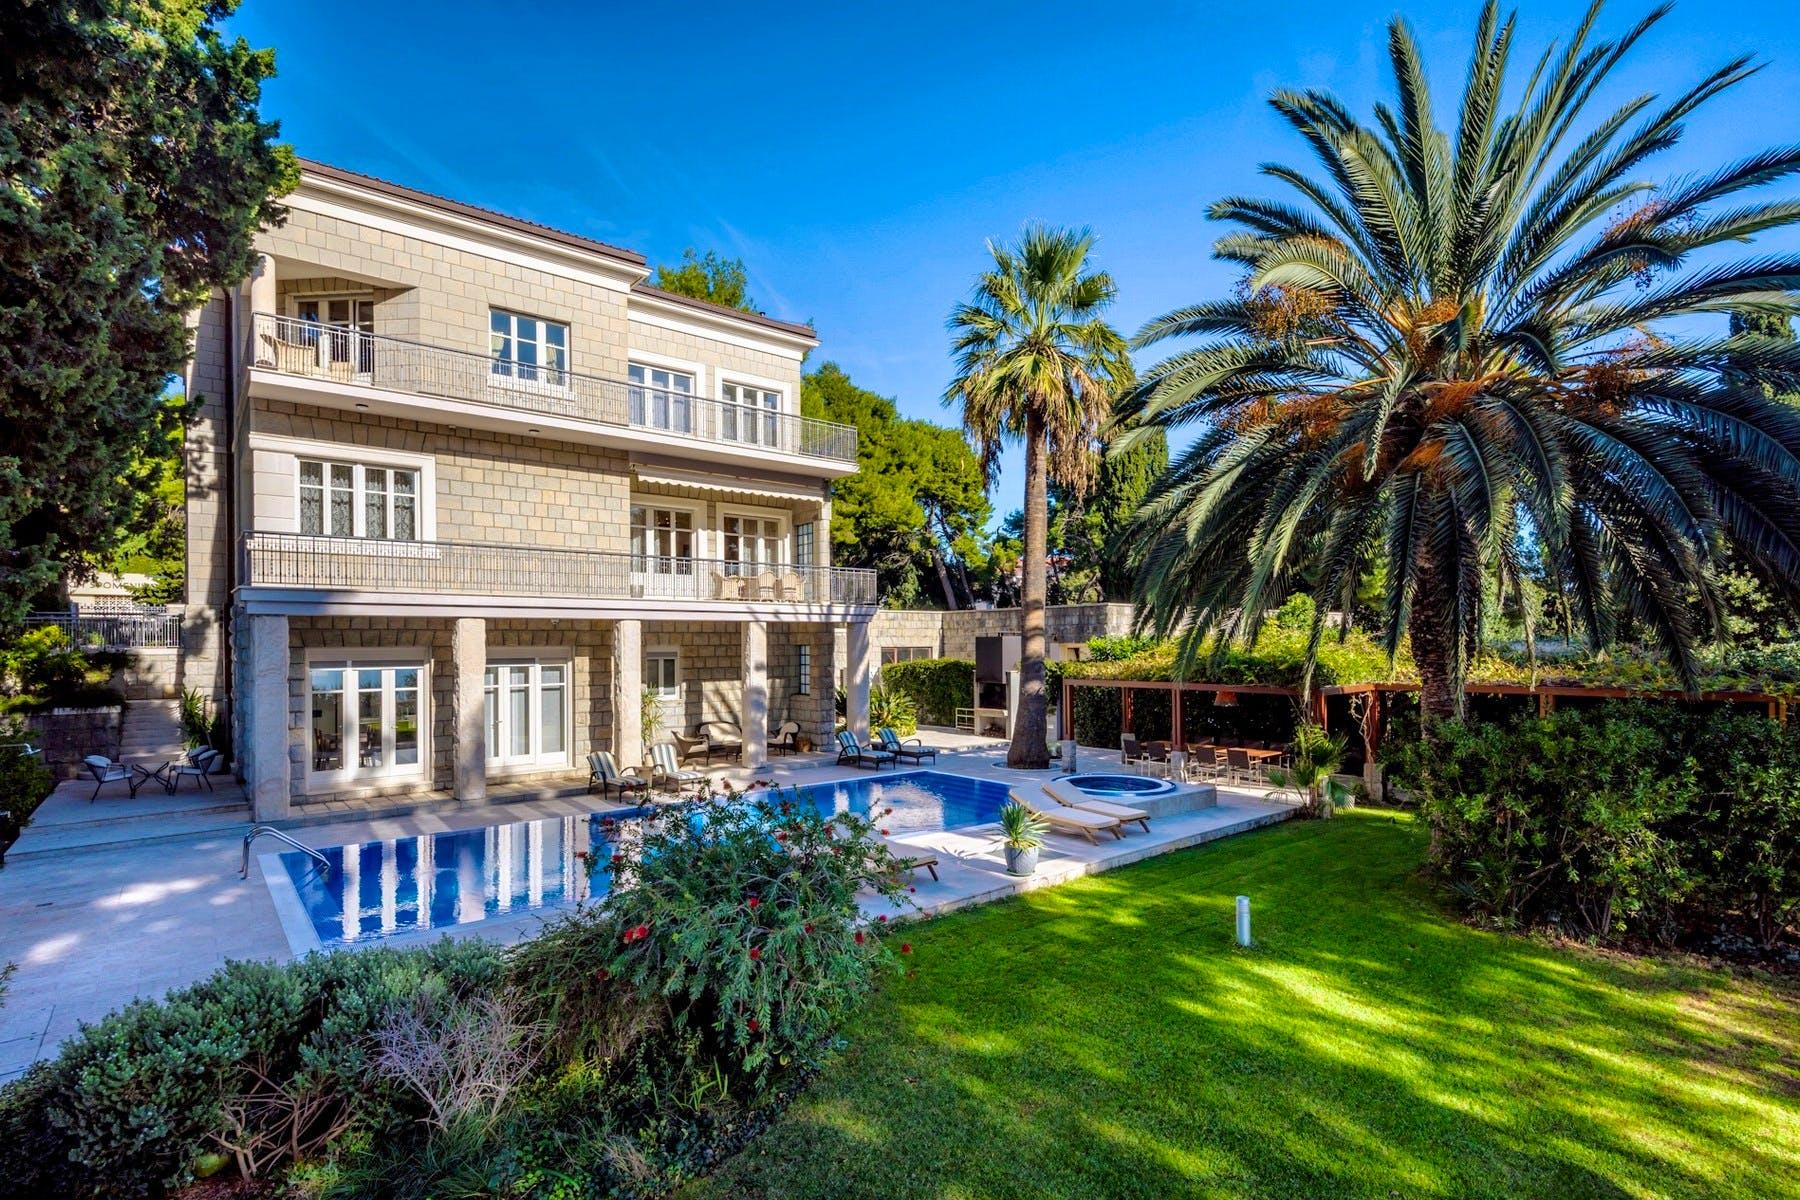 Elegantna kamena vila s bazenom i mediteranskim vrtom